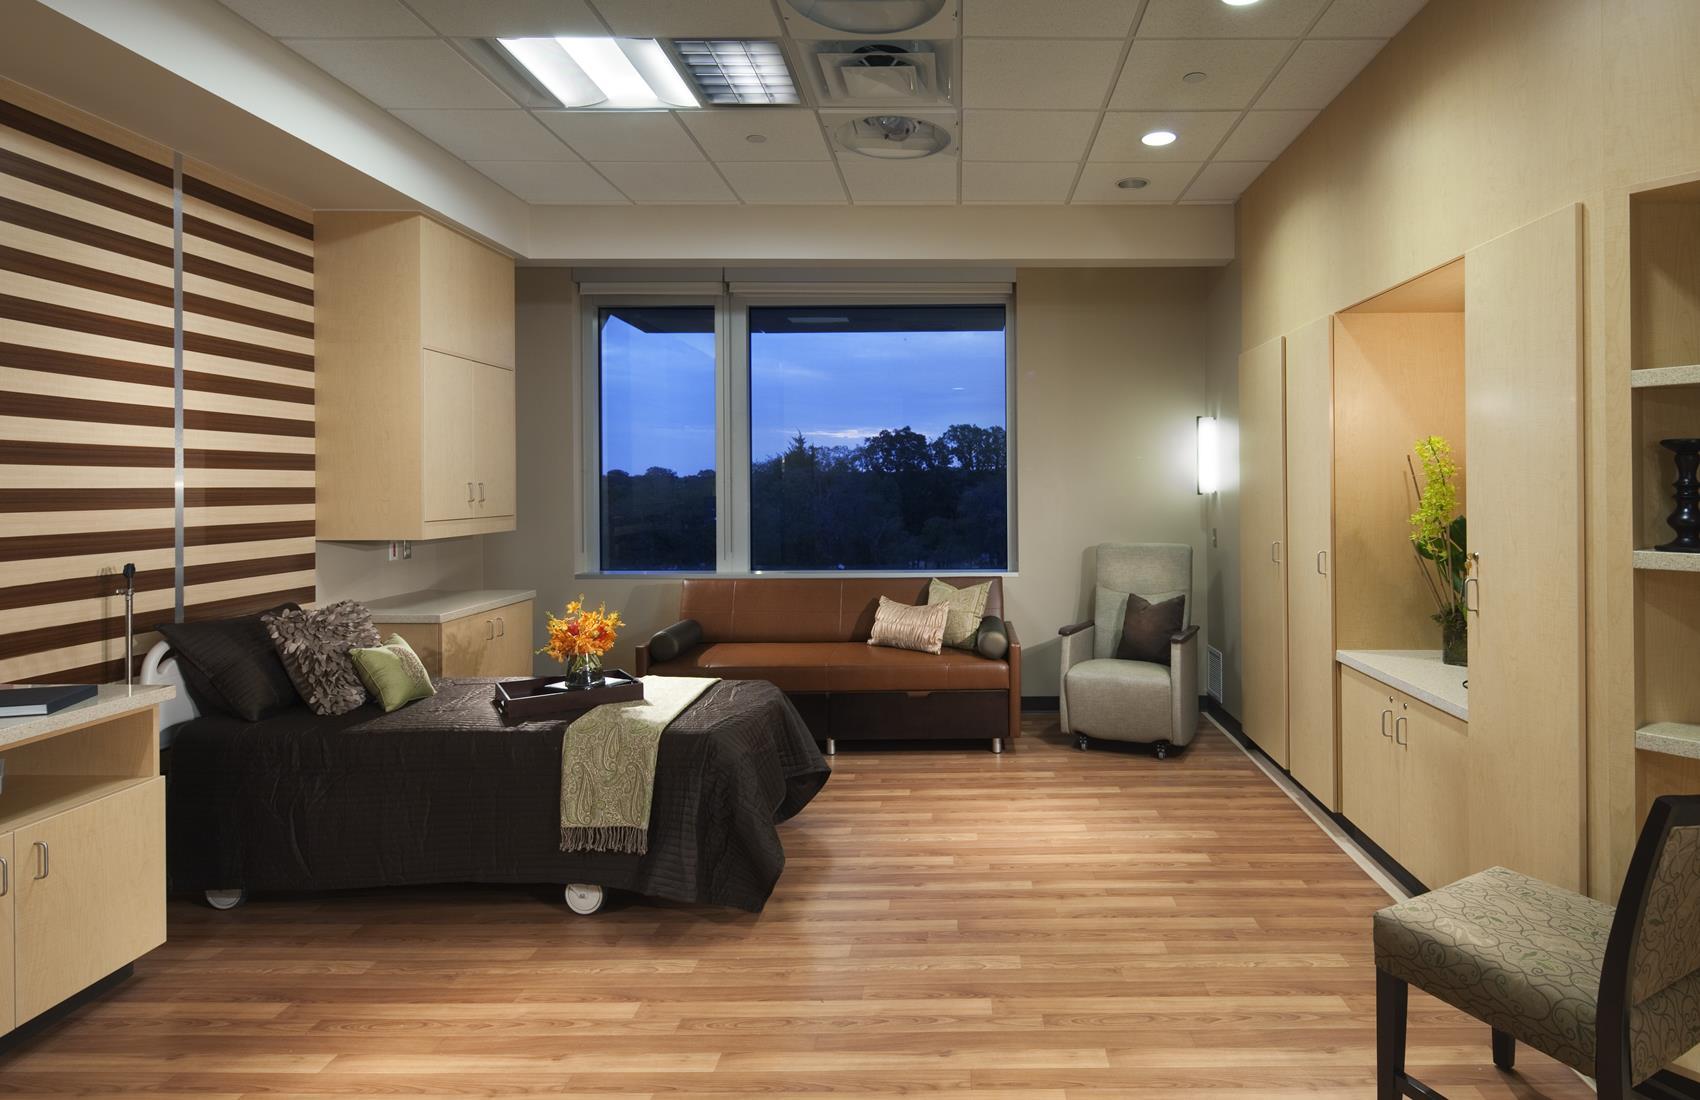 Patient room at Integris Health Edmond